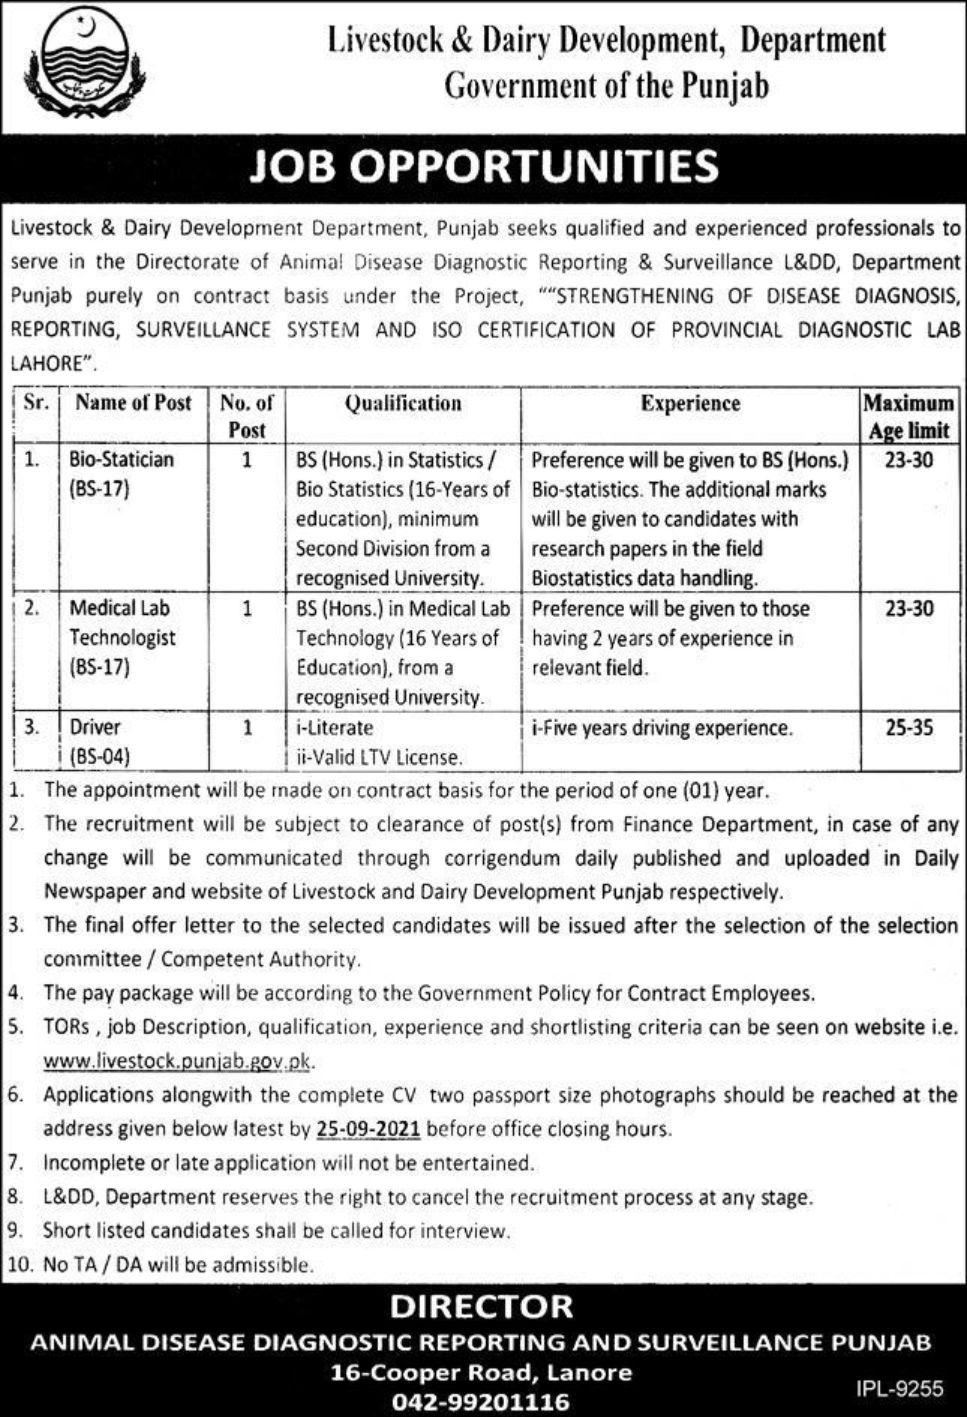 Livestock & Dairy Development Department Government of the Punjab Vacancies 2021 3